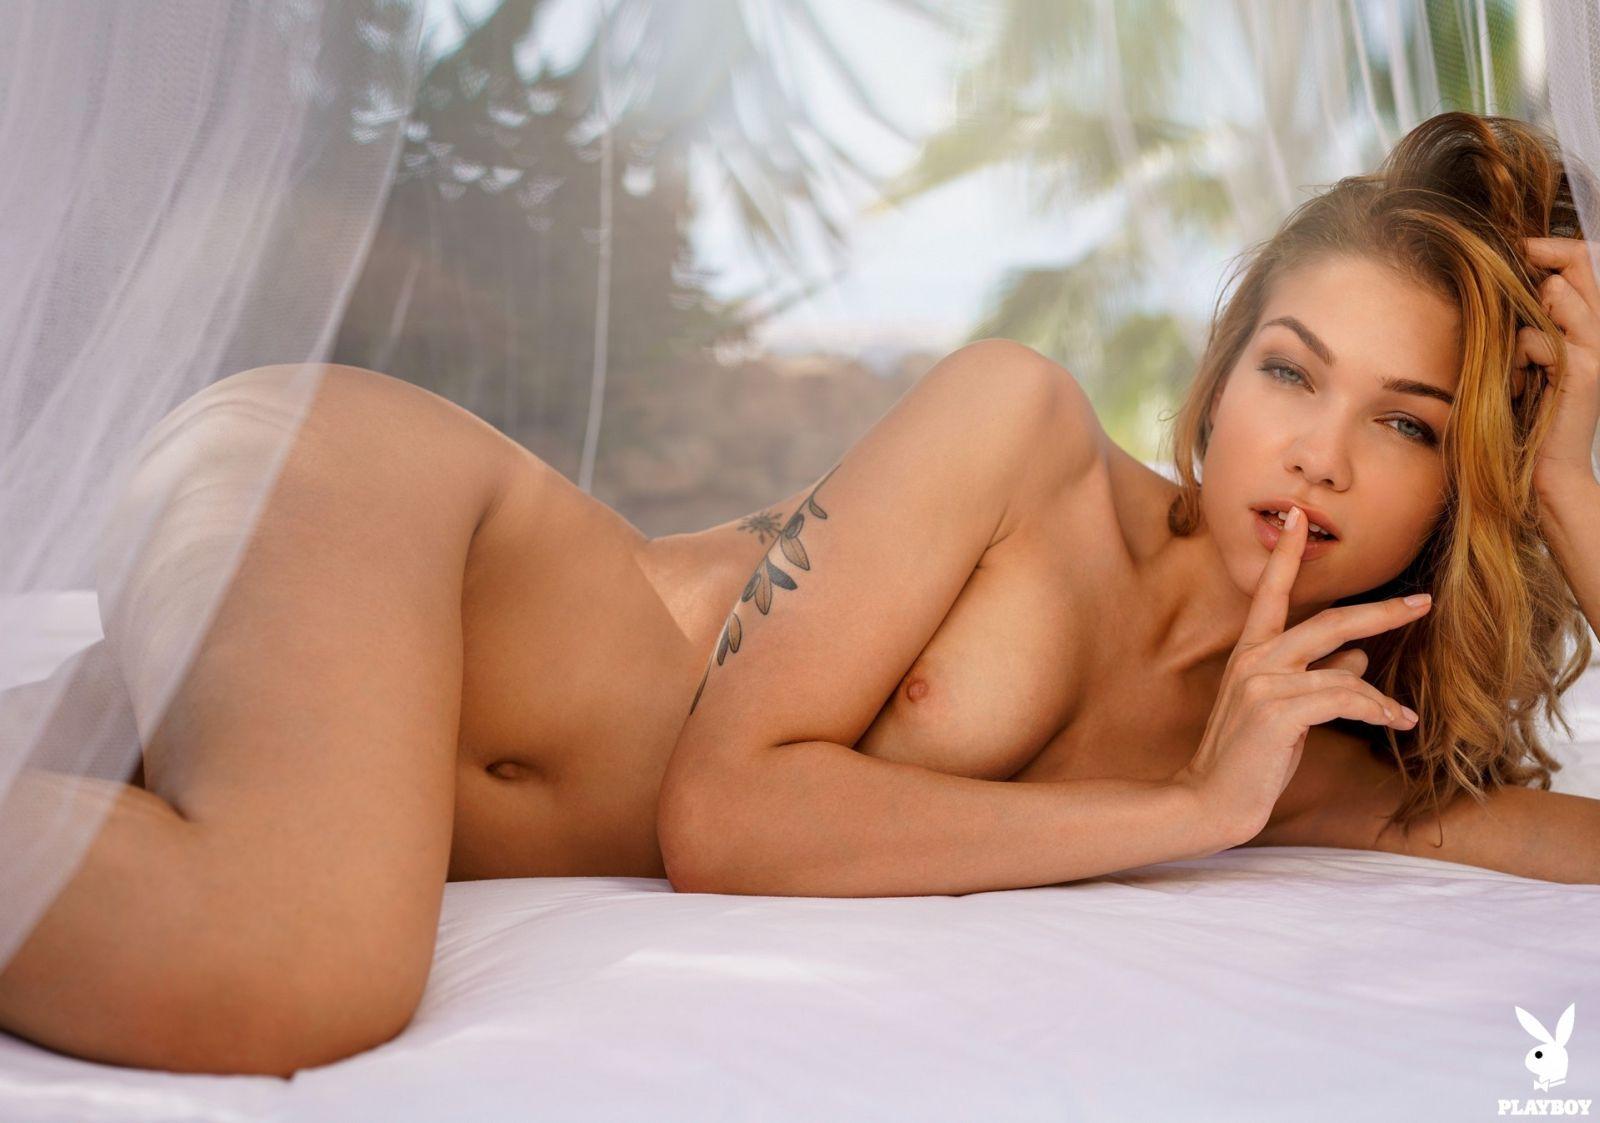 Nackte girls playboy Nude Playmates,